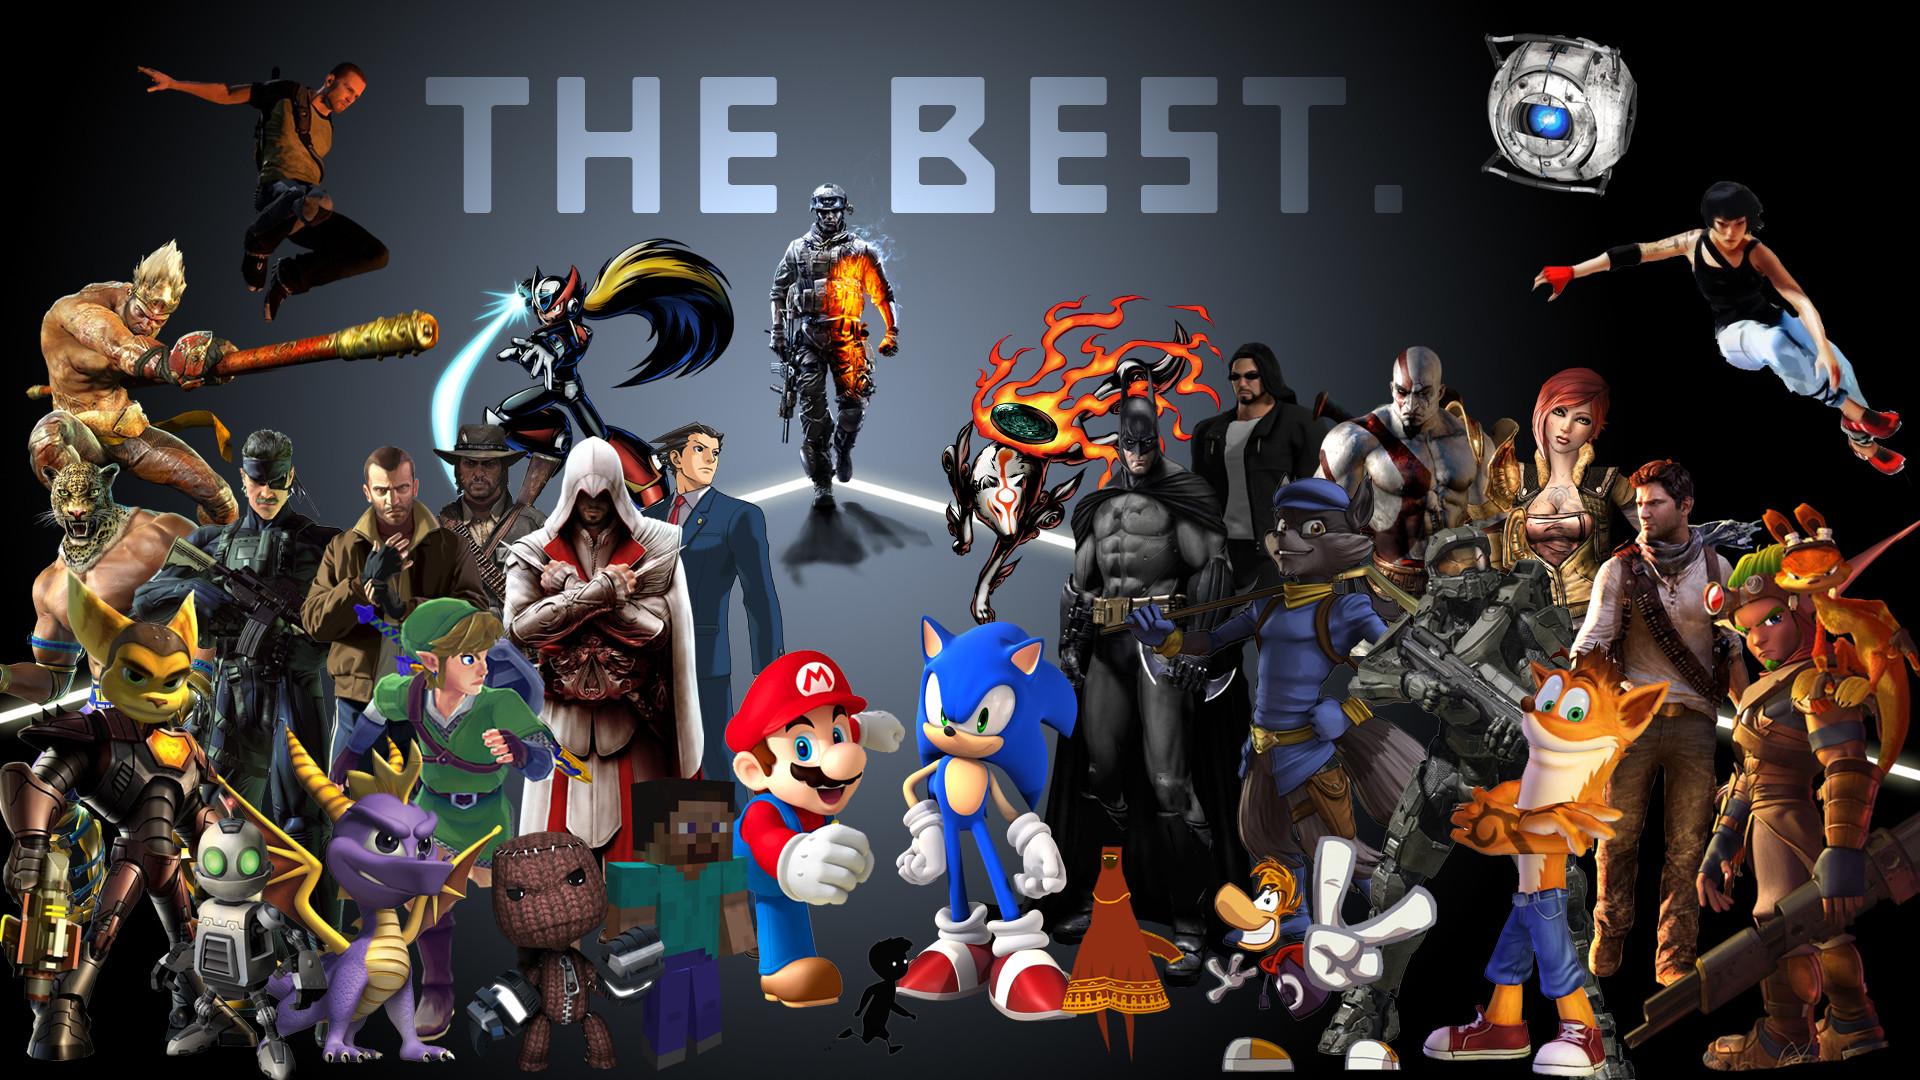 pacduck fan art wallpaper games 2012 2015 pacduck the best video game .